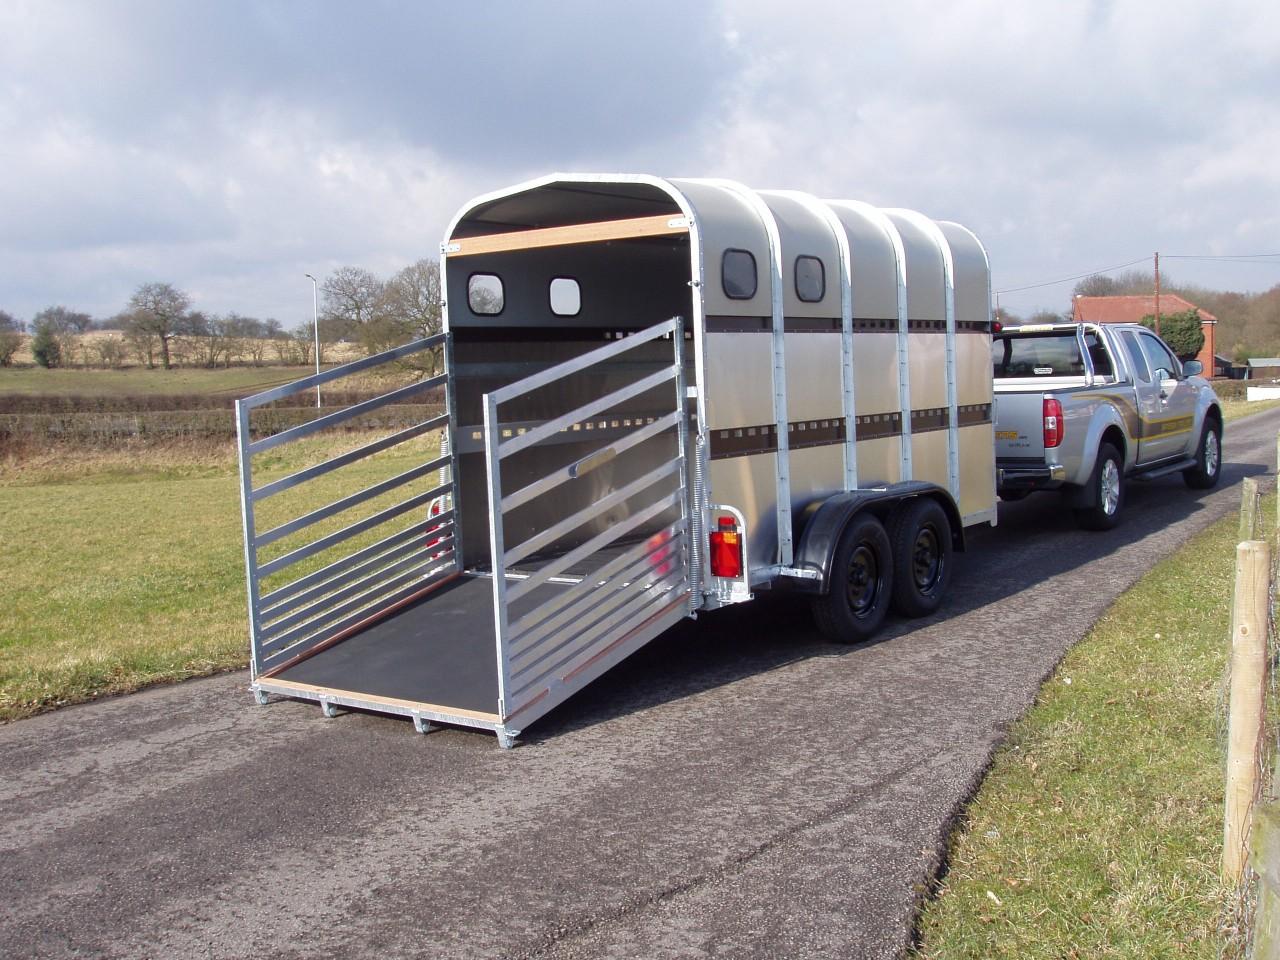 48hb 12 X 5 8 X 7 Livestock Trailer Bateson Trailers